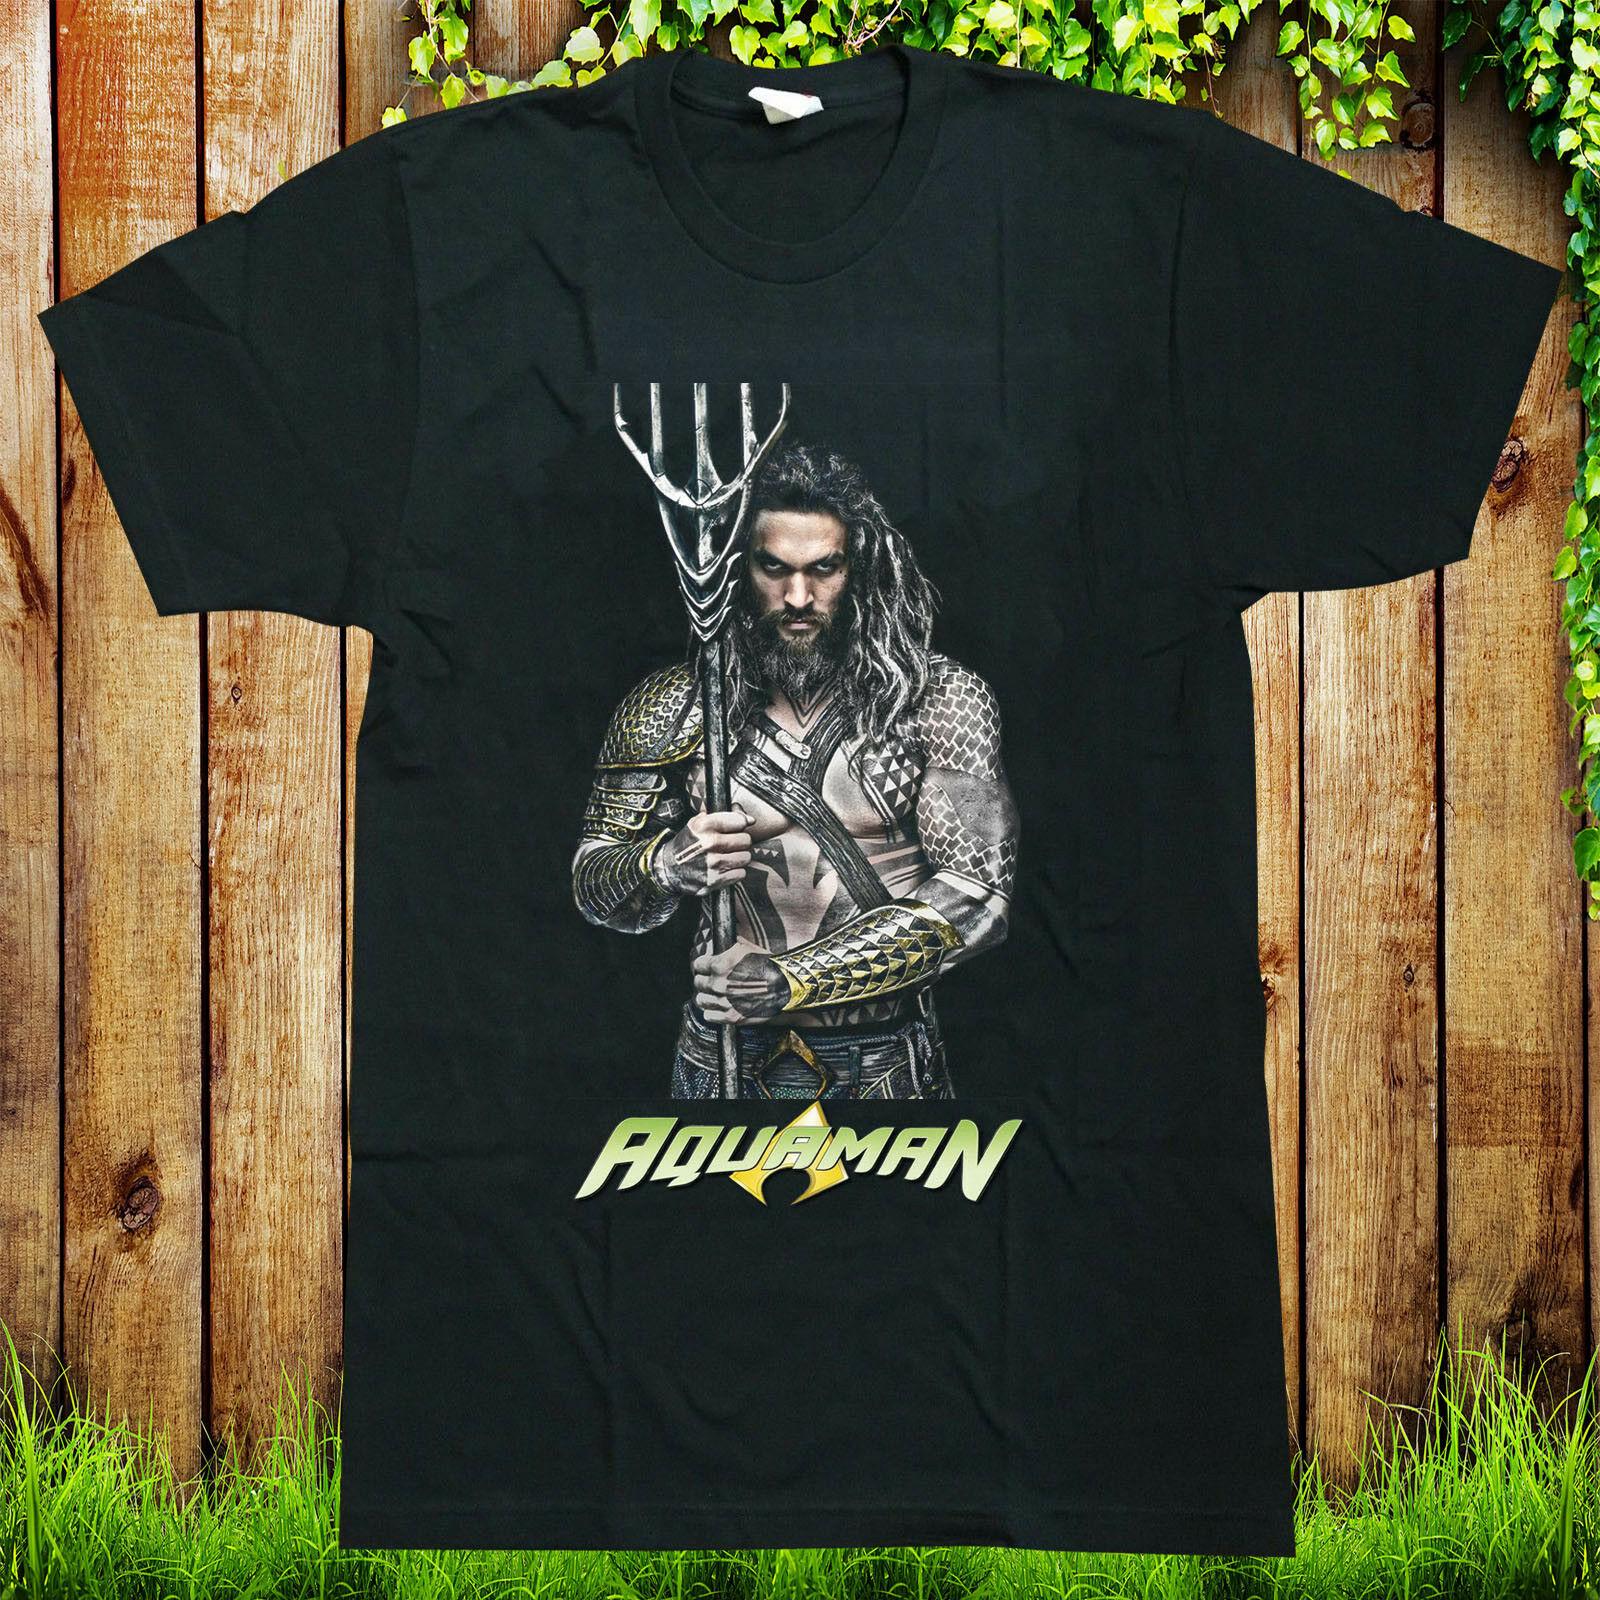 Aquaman iron on T shirt transfer Choose image and size